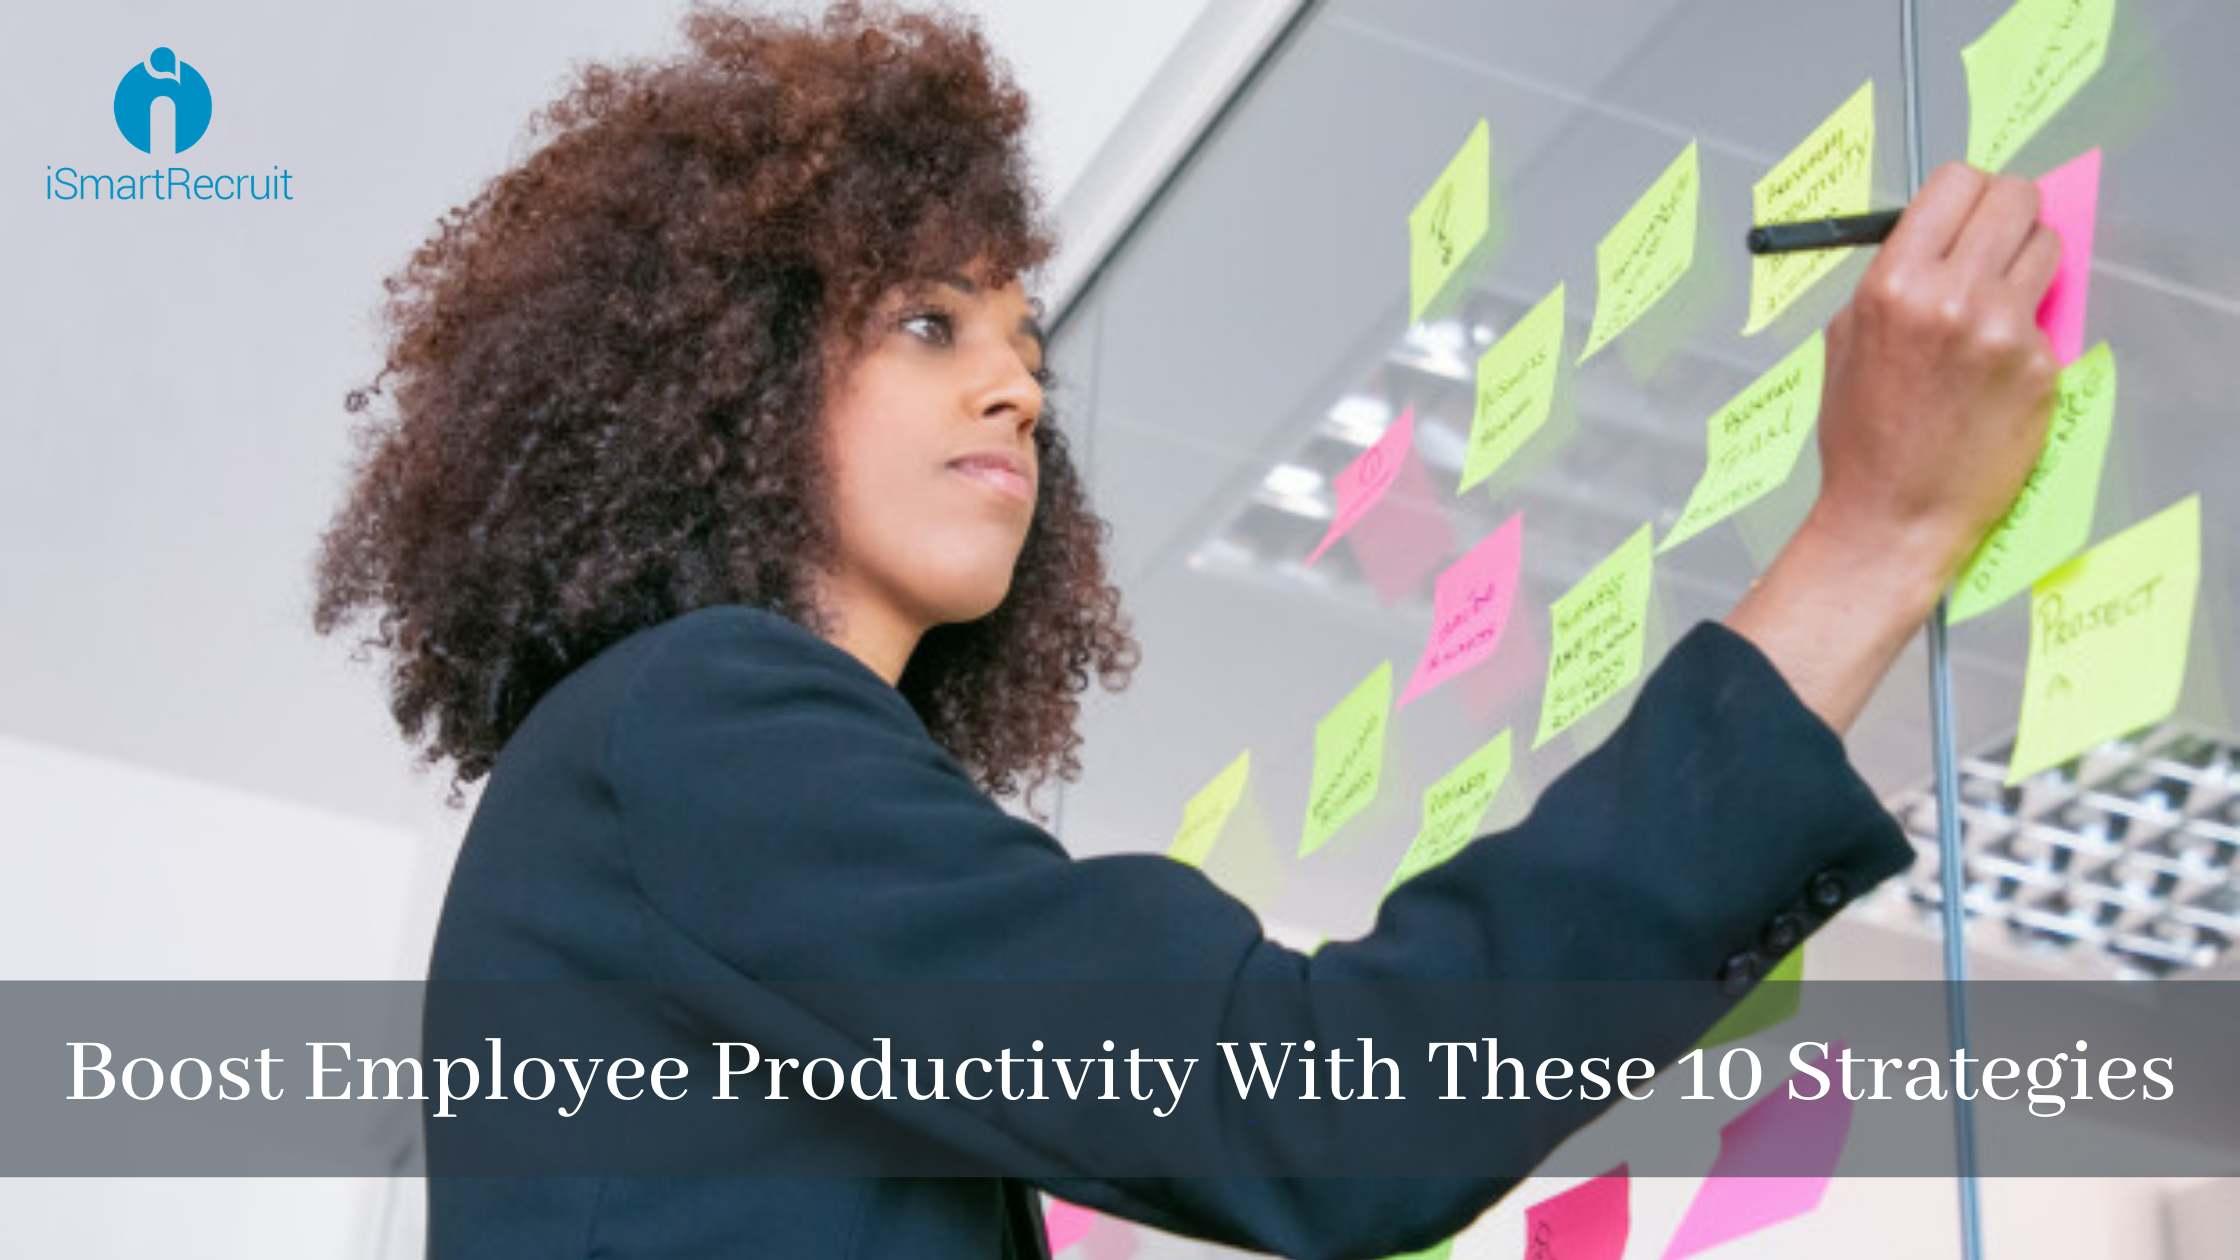 10 Best Strategies to Improve Employee Productivity